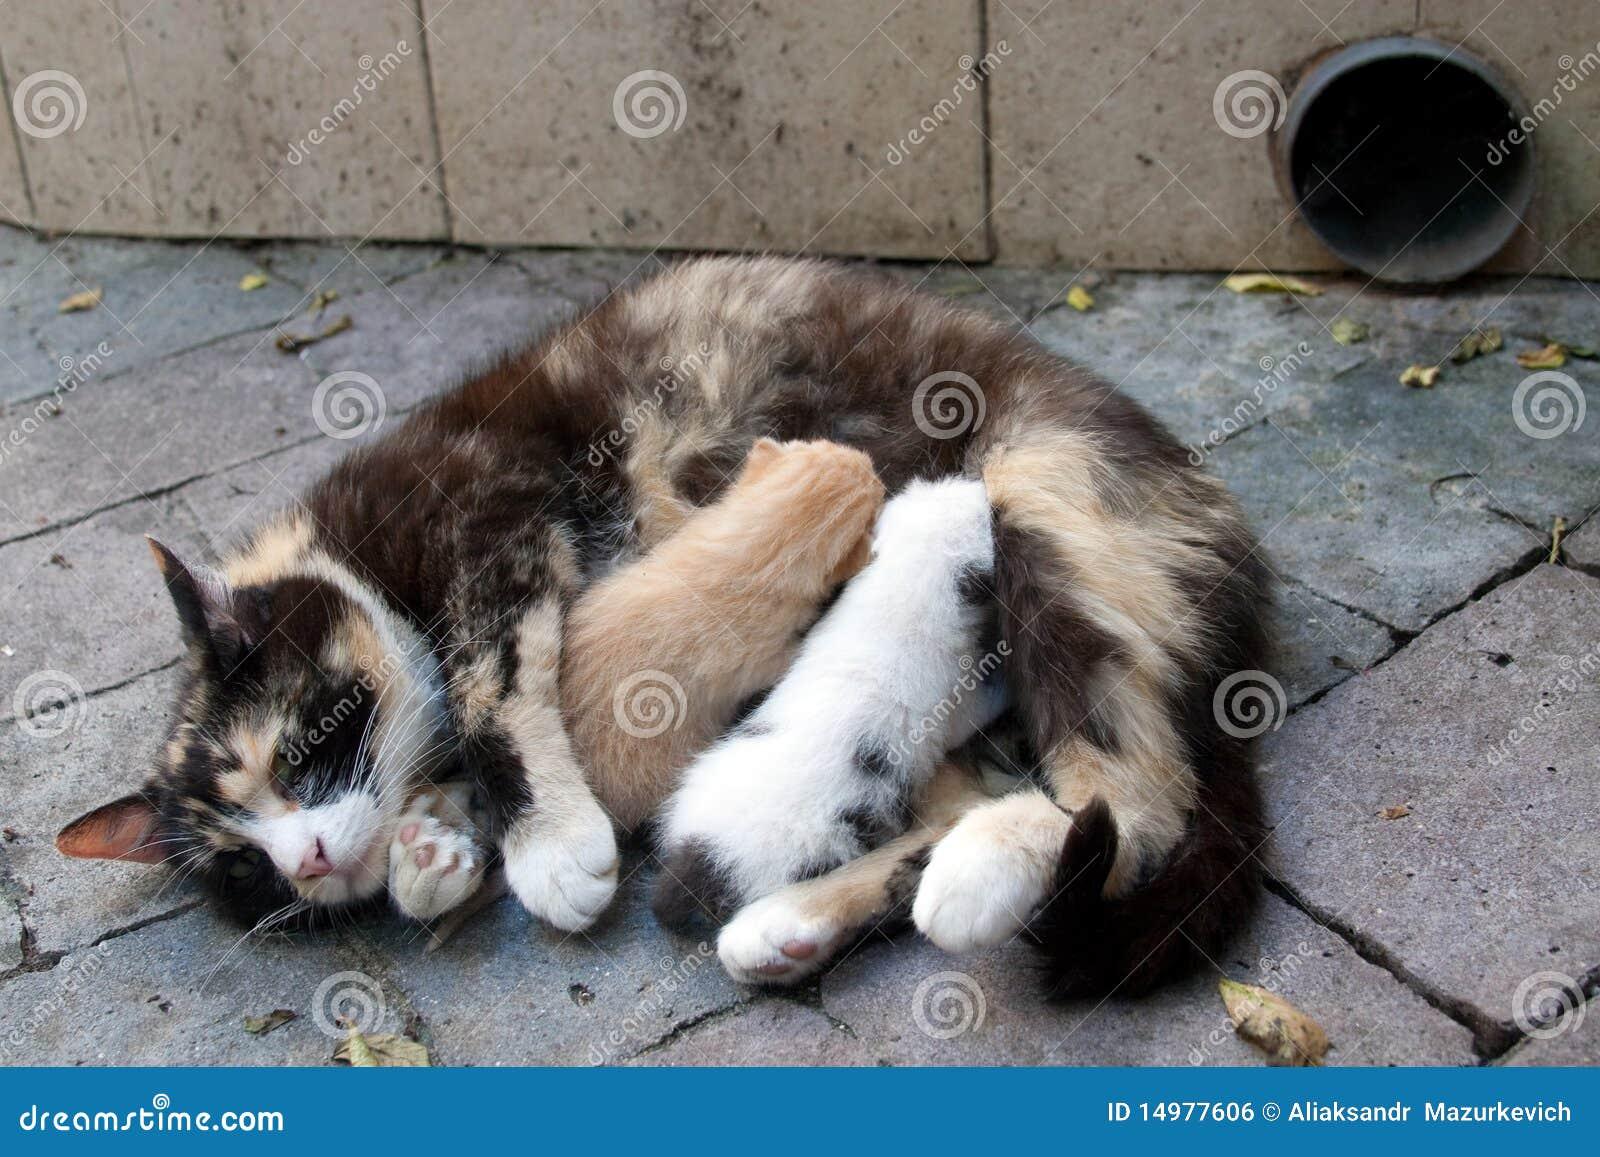 Cat feeding two kittens stock photo Image of motherhood